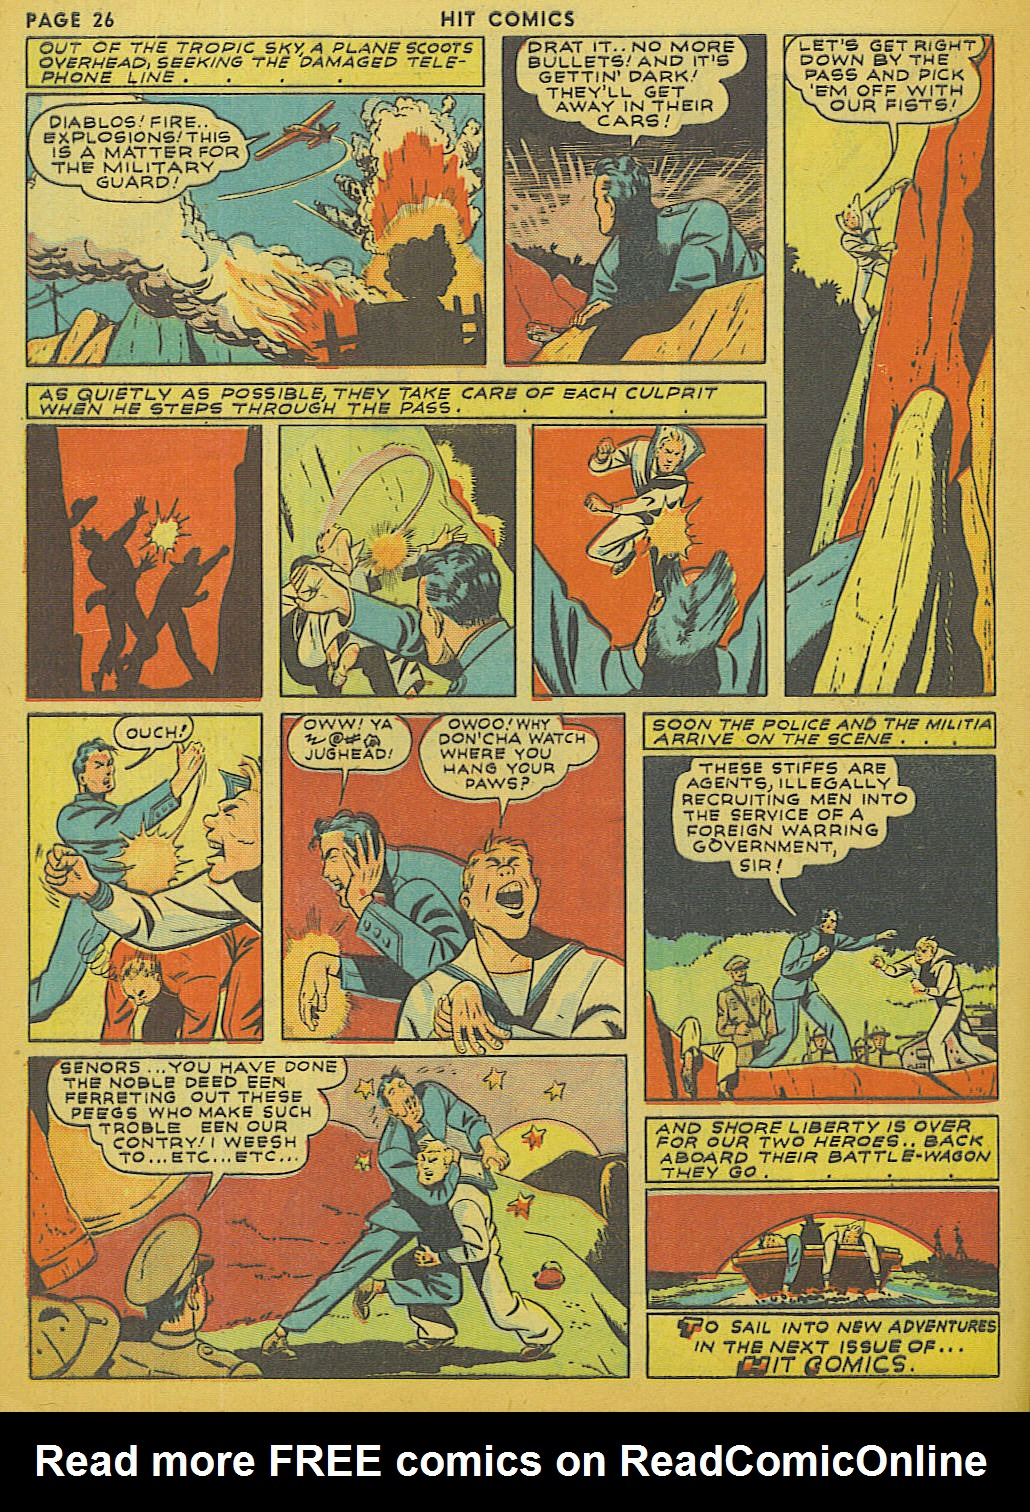 Read online Hit Comics comic -  Issue #13 - 28